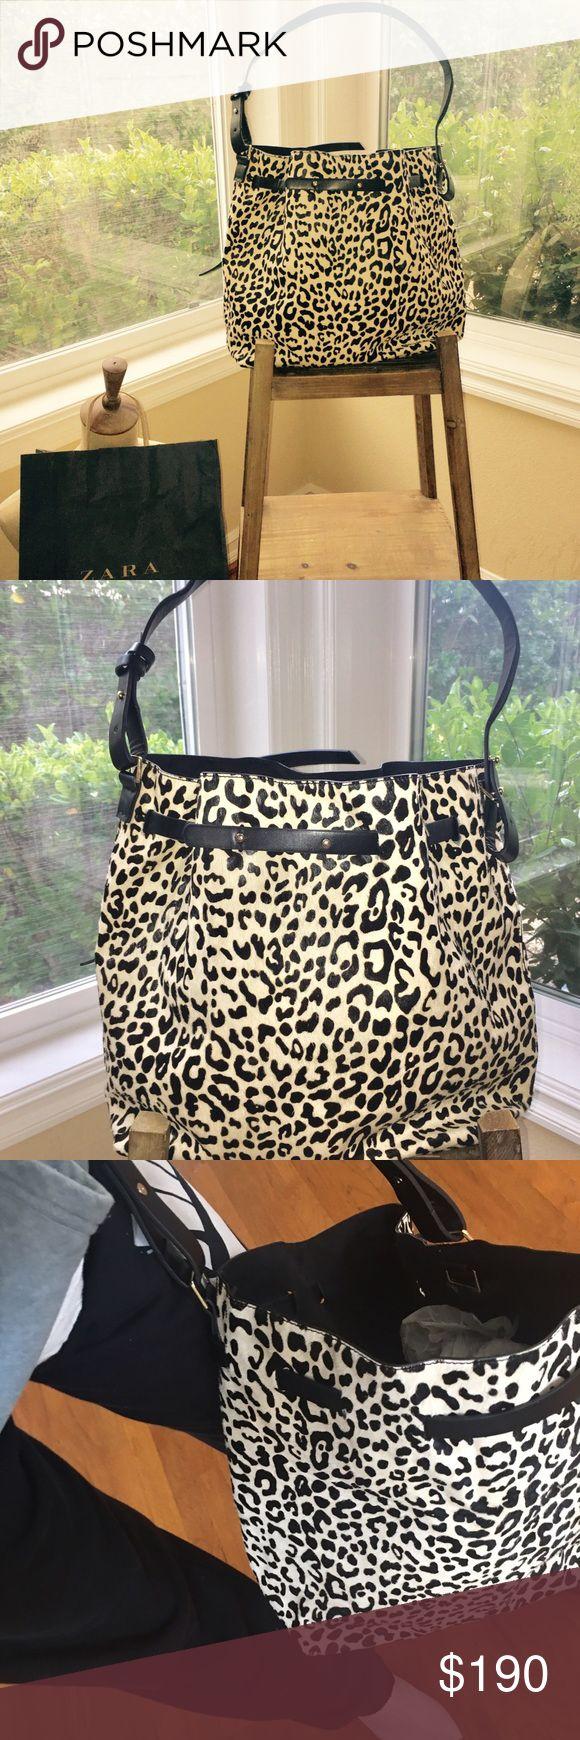 Zara Handbag Zara like new black white fur leather handle suede inner stunning sold out Zara Bags Shoulder Bags